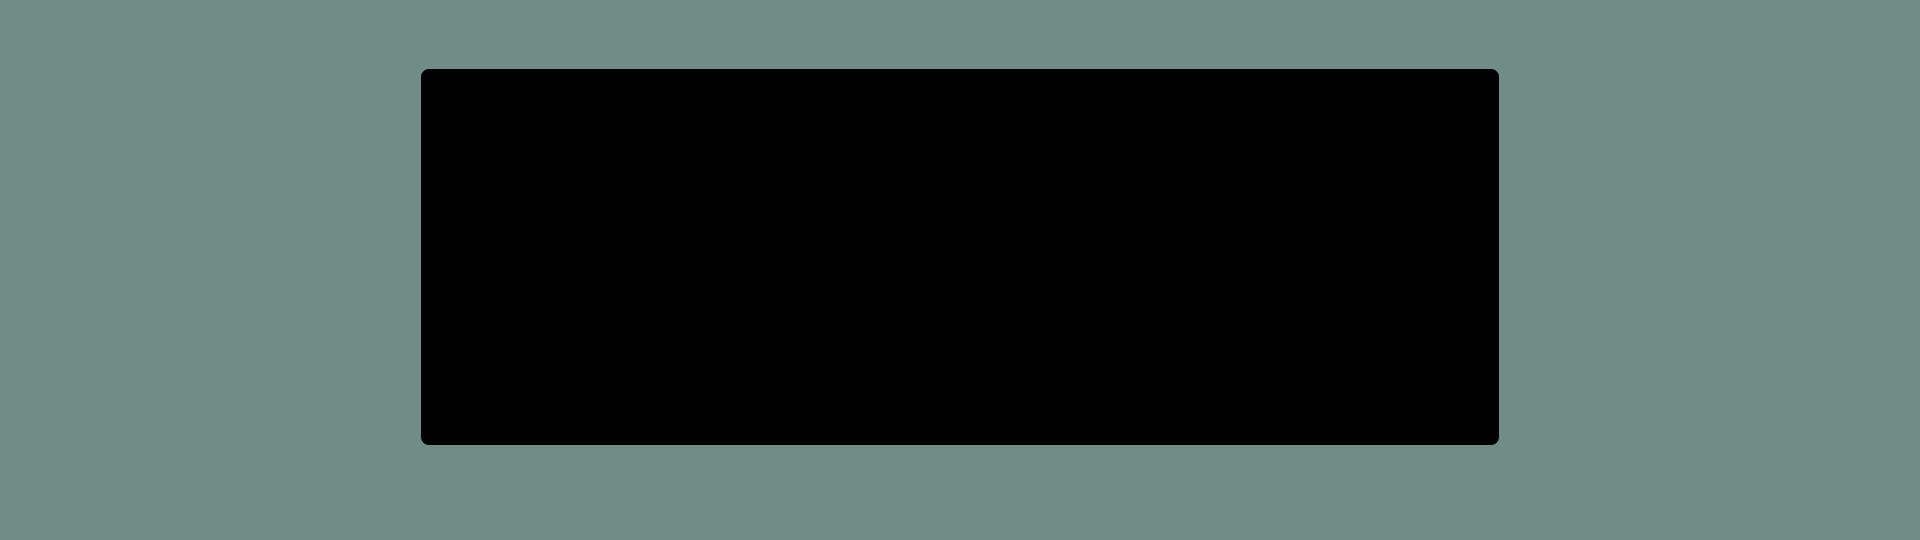 CATEGORY-TV-USTUNGORUNTUKALITESIJENERIK-28-01